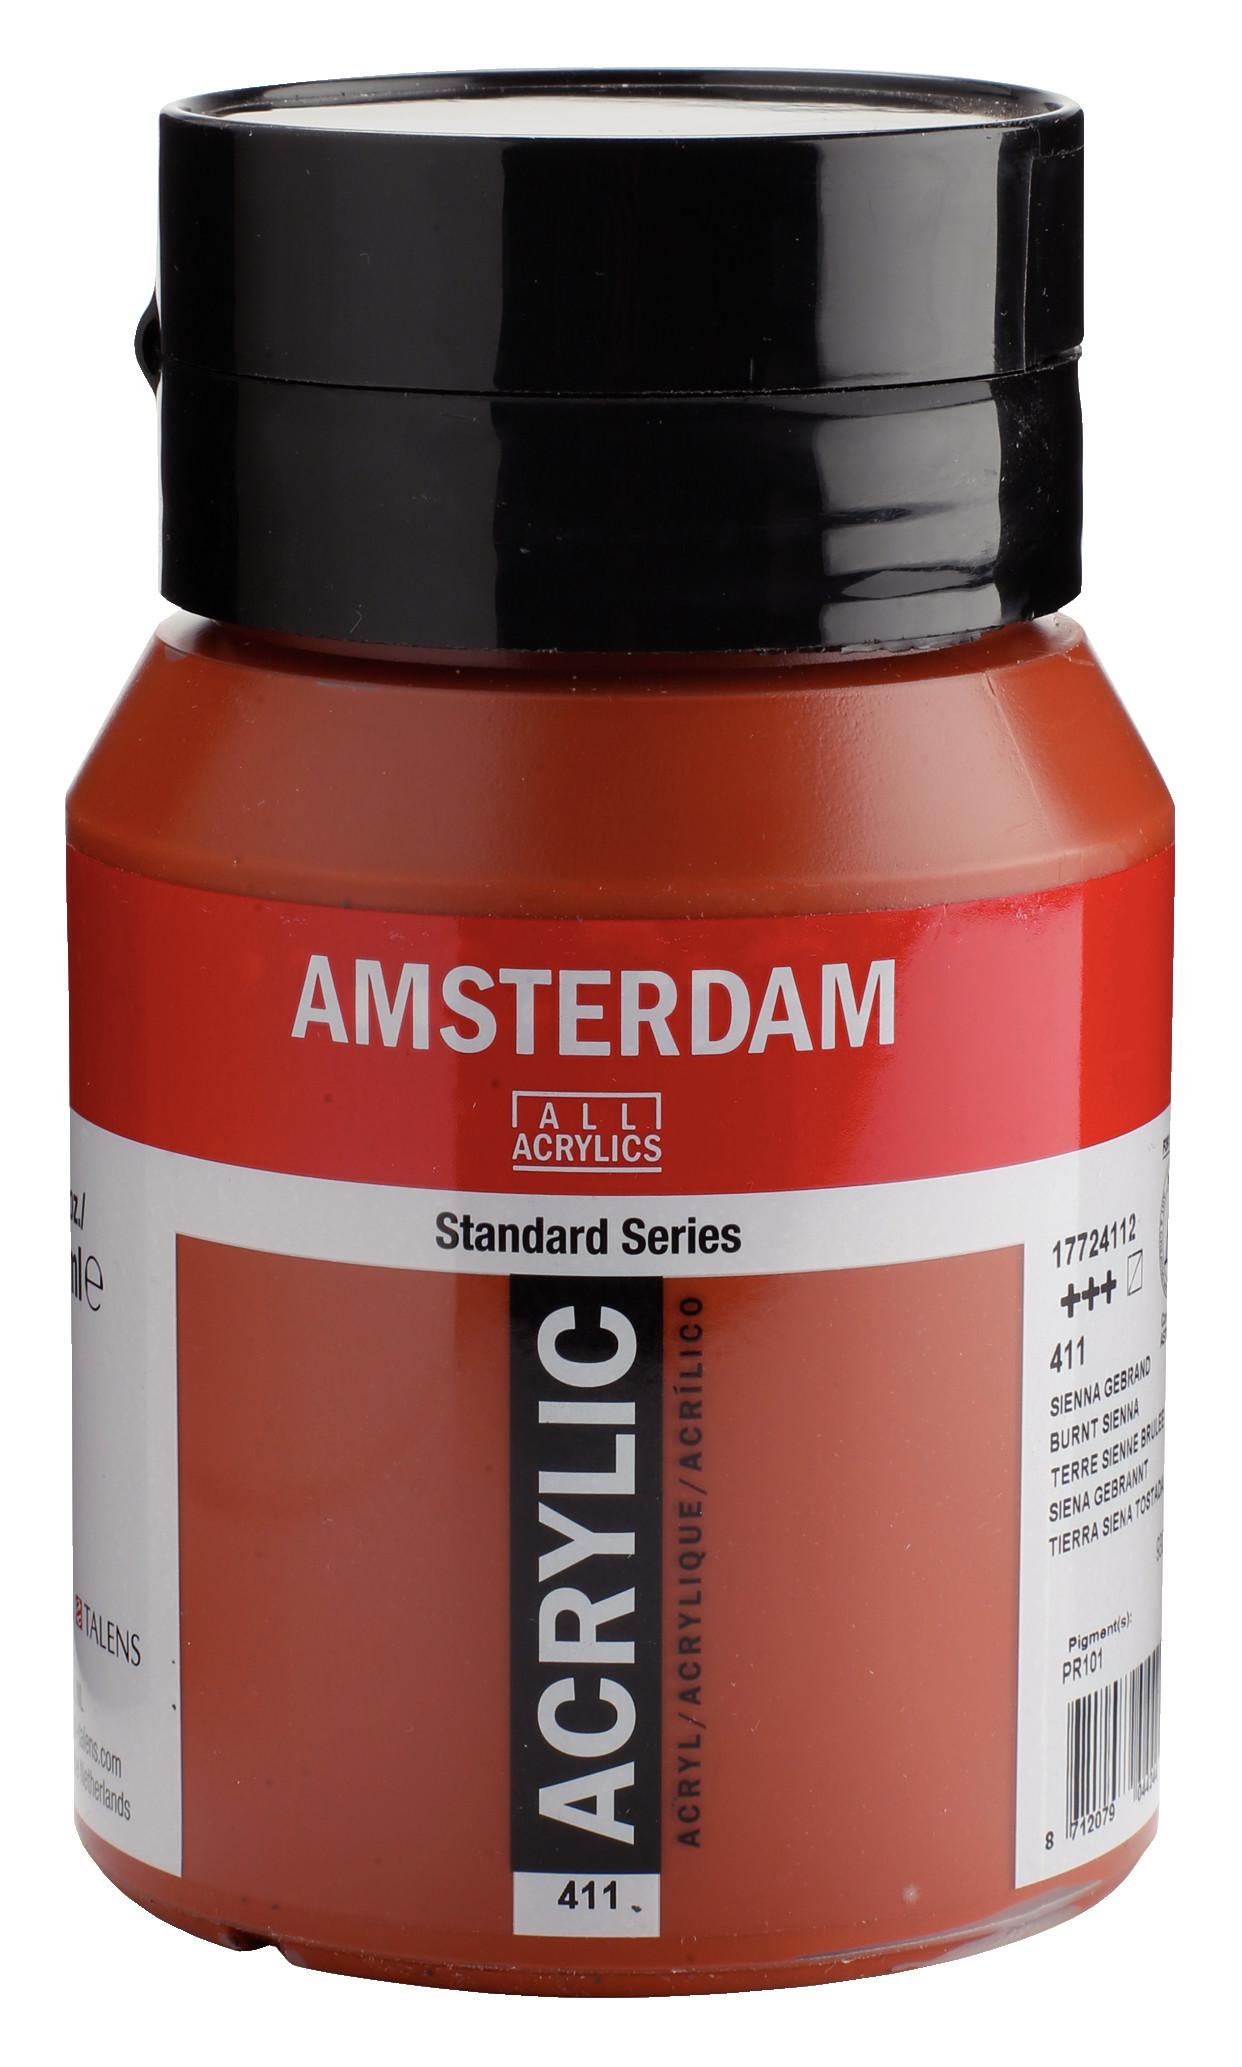 Amsterdam Standard Series Acrylic Jar 500 ml Burnt sienna 411